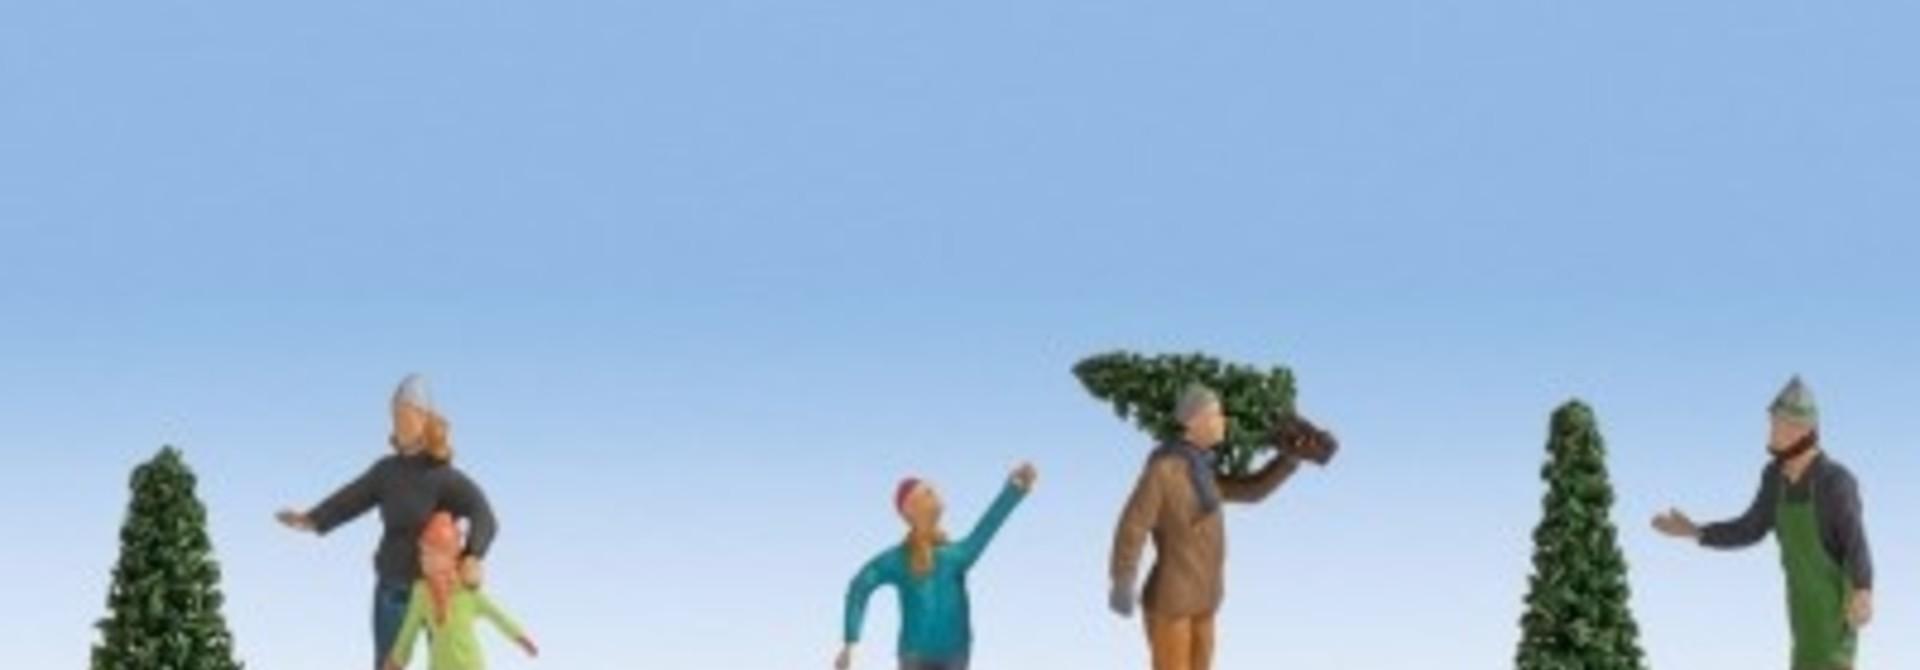 15927 Selling Christmas Trees